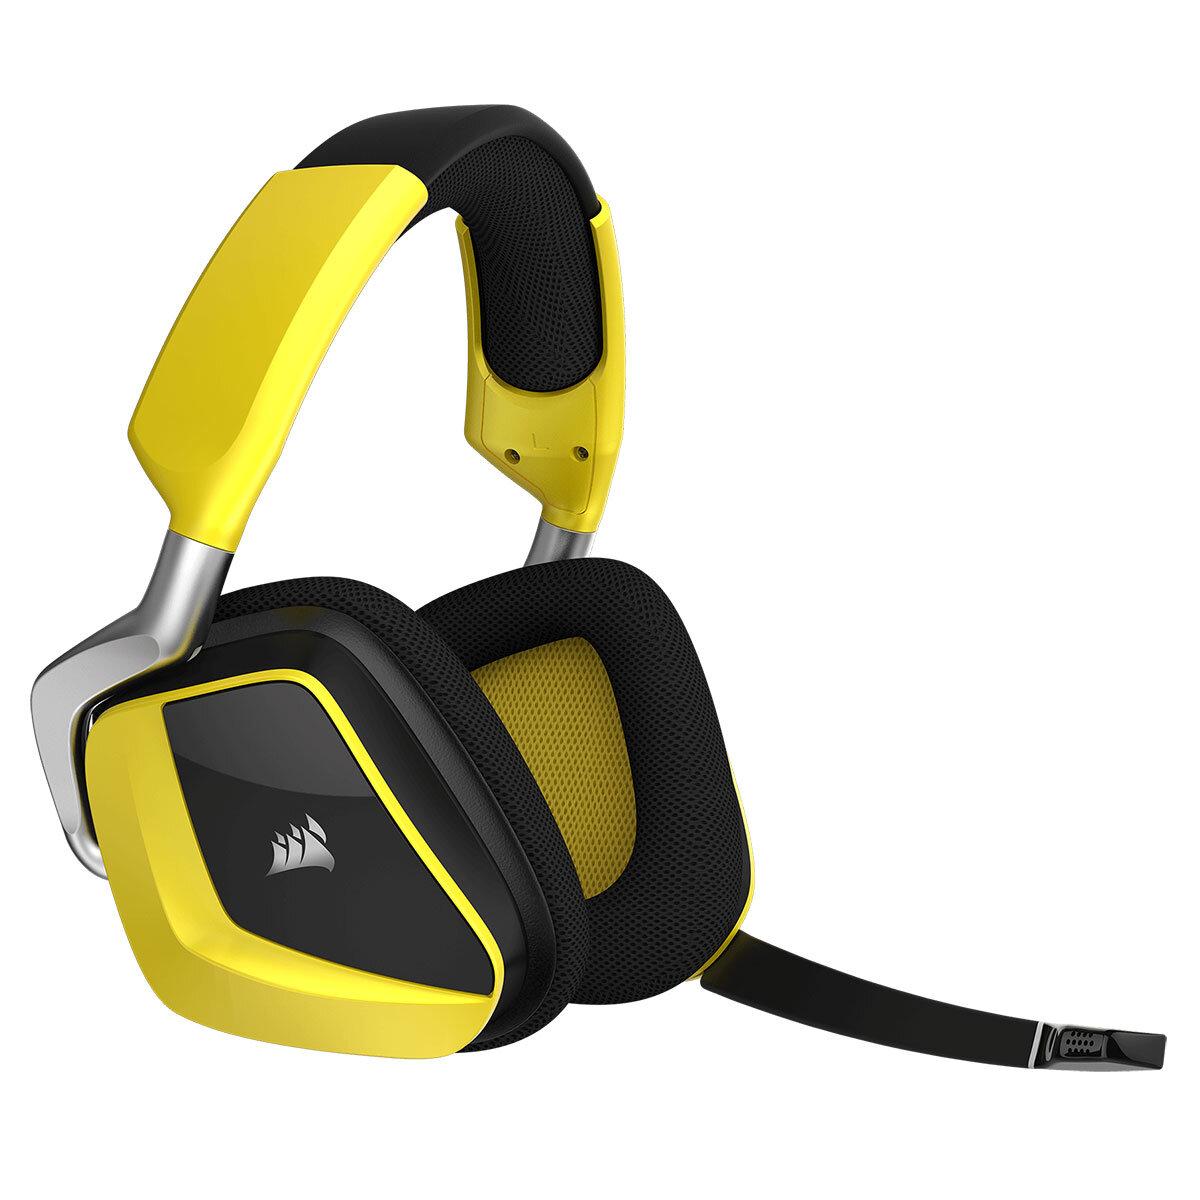 Tai nghe - Headphone Corsair VOID V2 Wireless